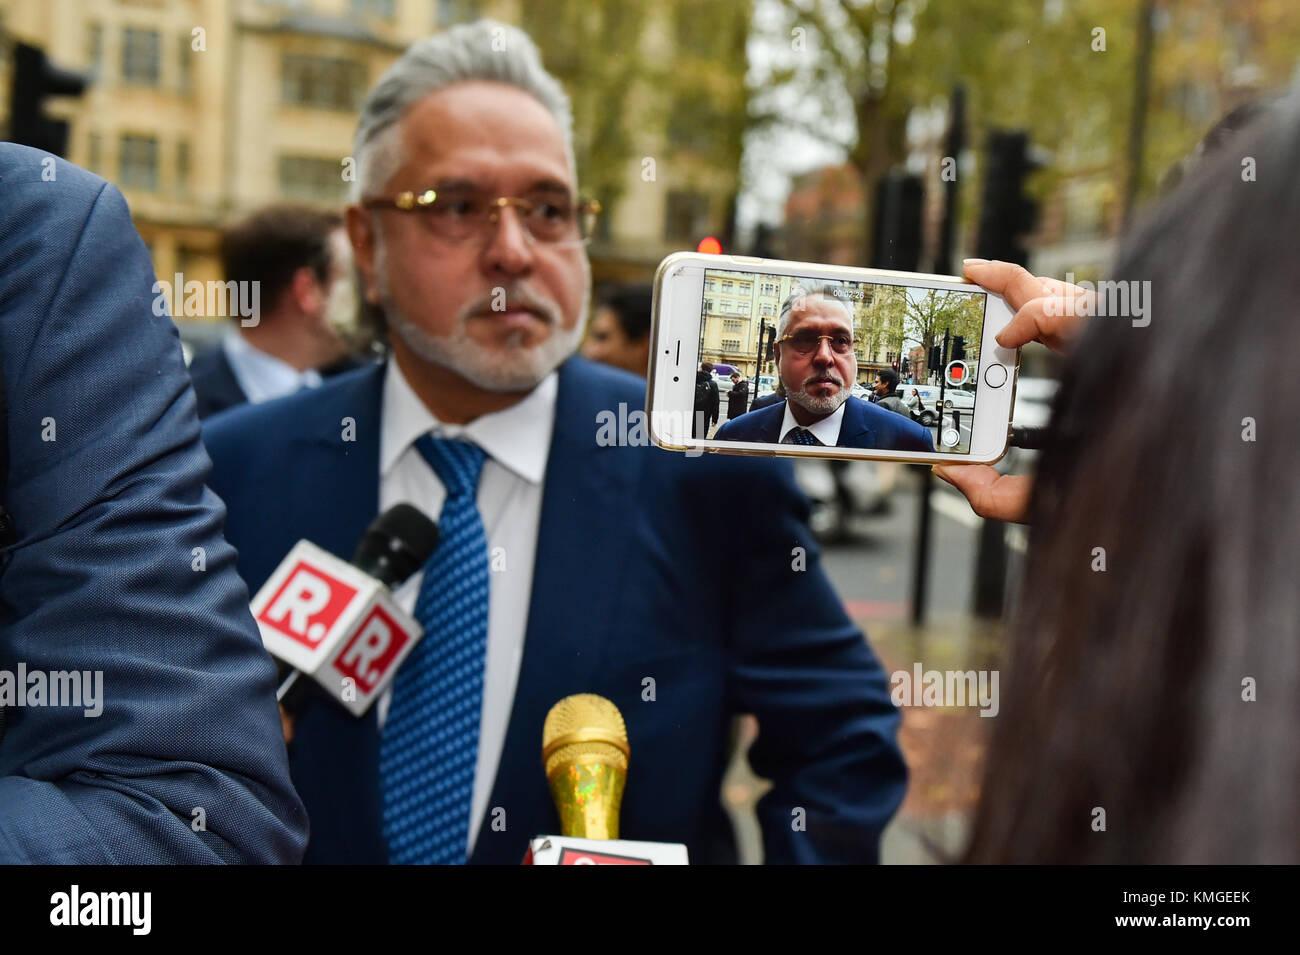 London, United Kingdom. 7th December 2017. Force India F1 boss Vijay Mallyae arrives at Westminster Magistrates' - Stock Image